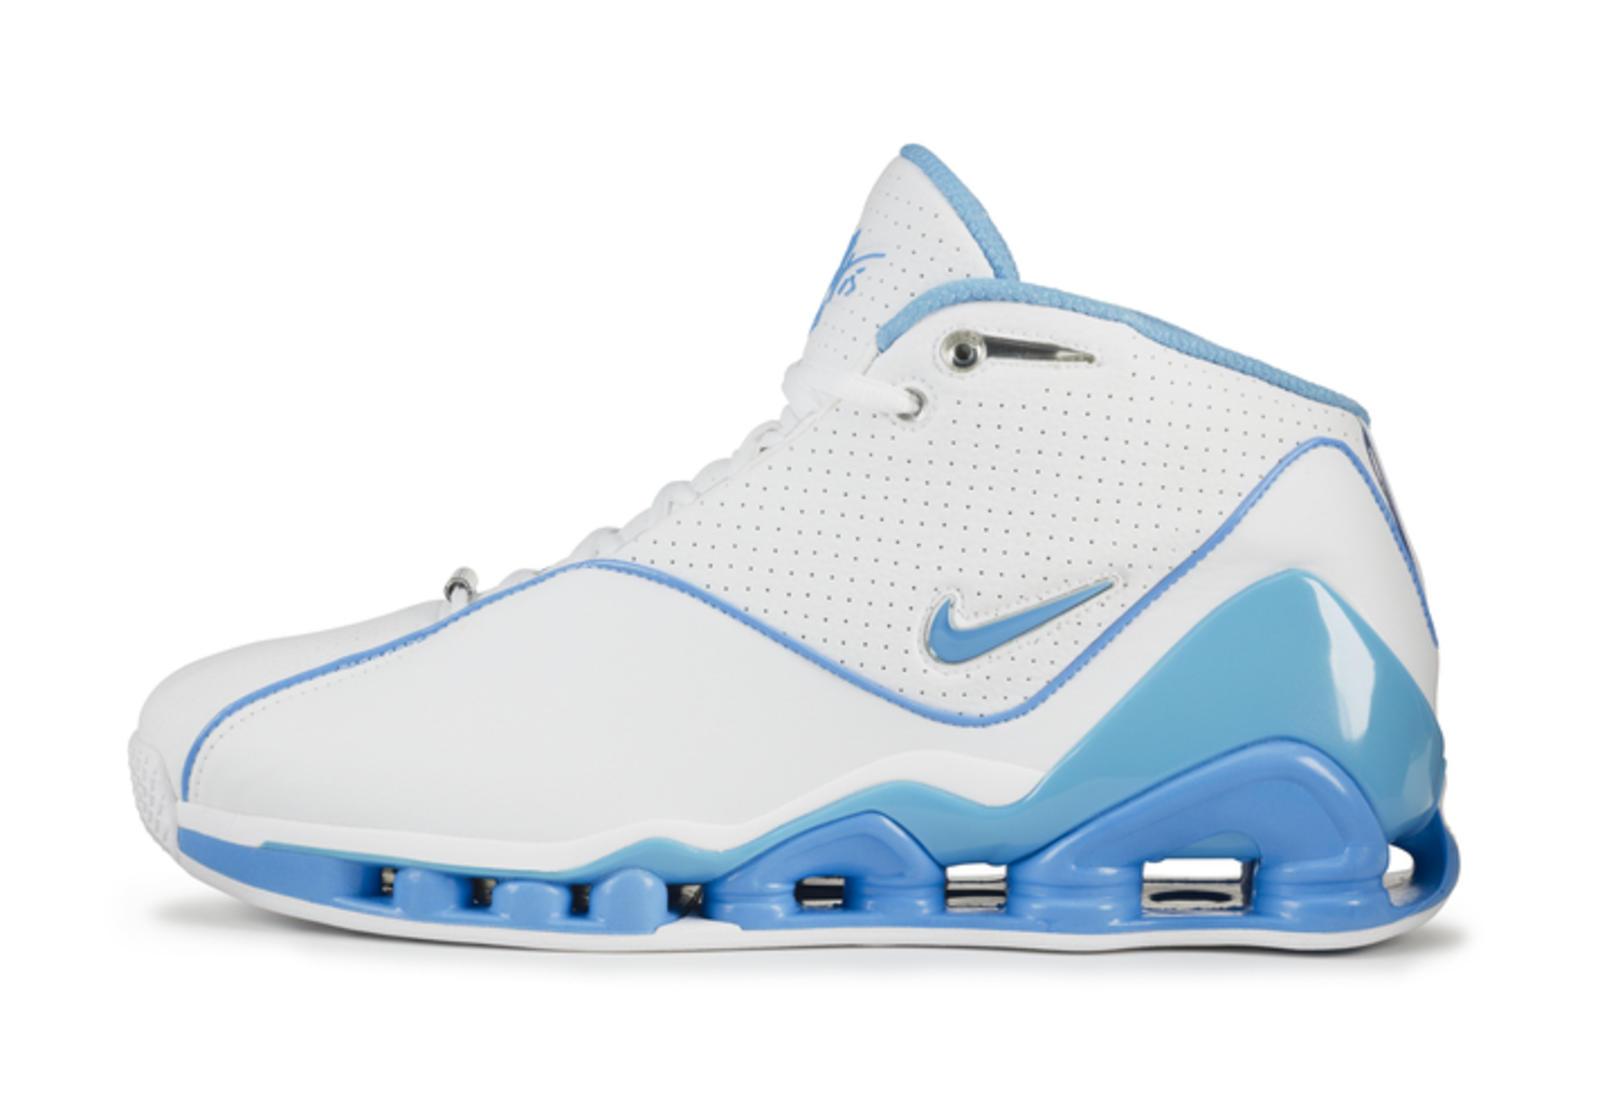 official photos 92a5a 6039a Nike shox VC II 2004